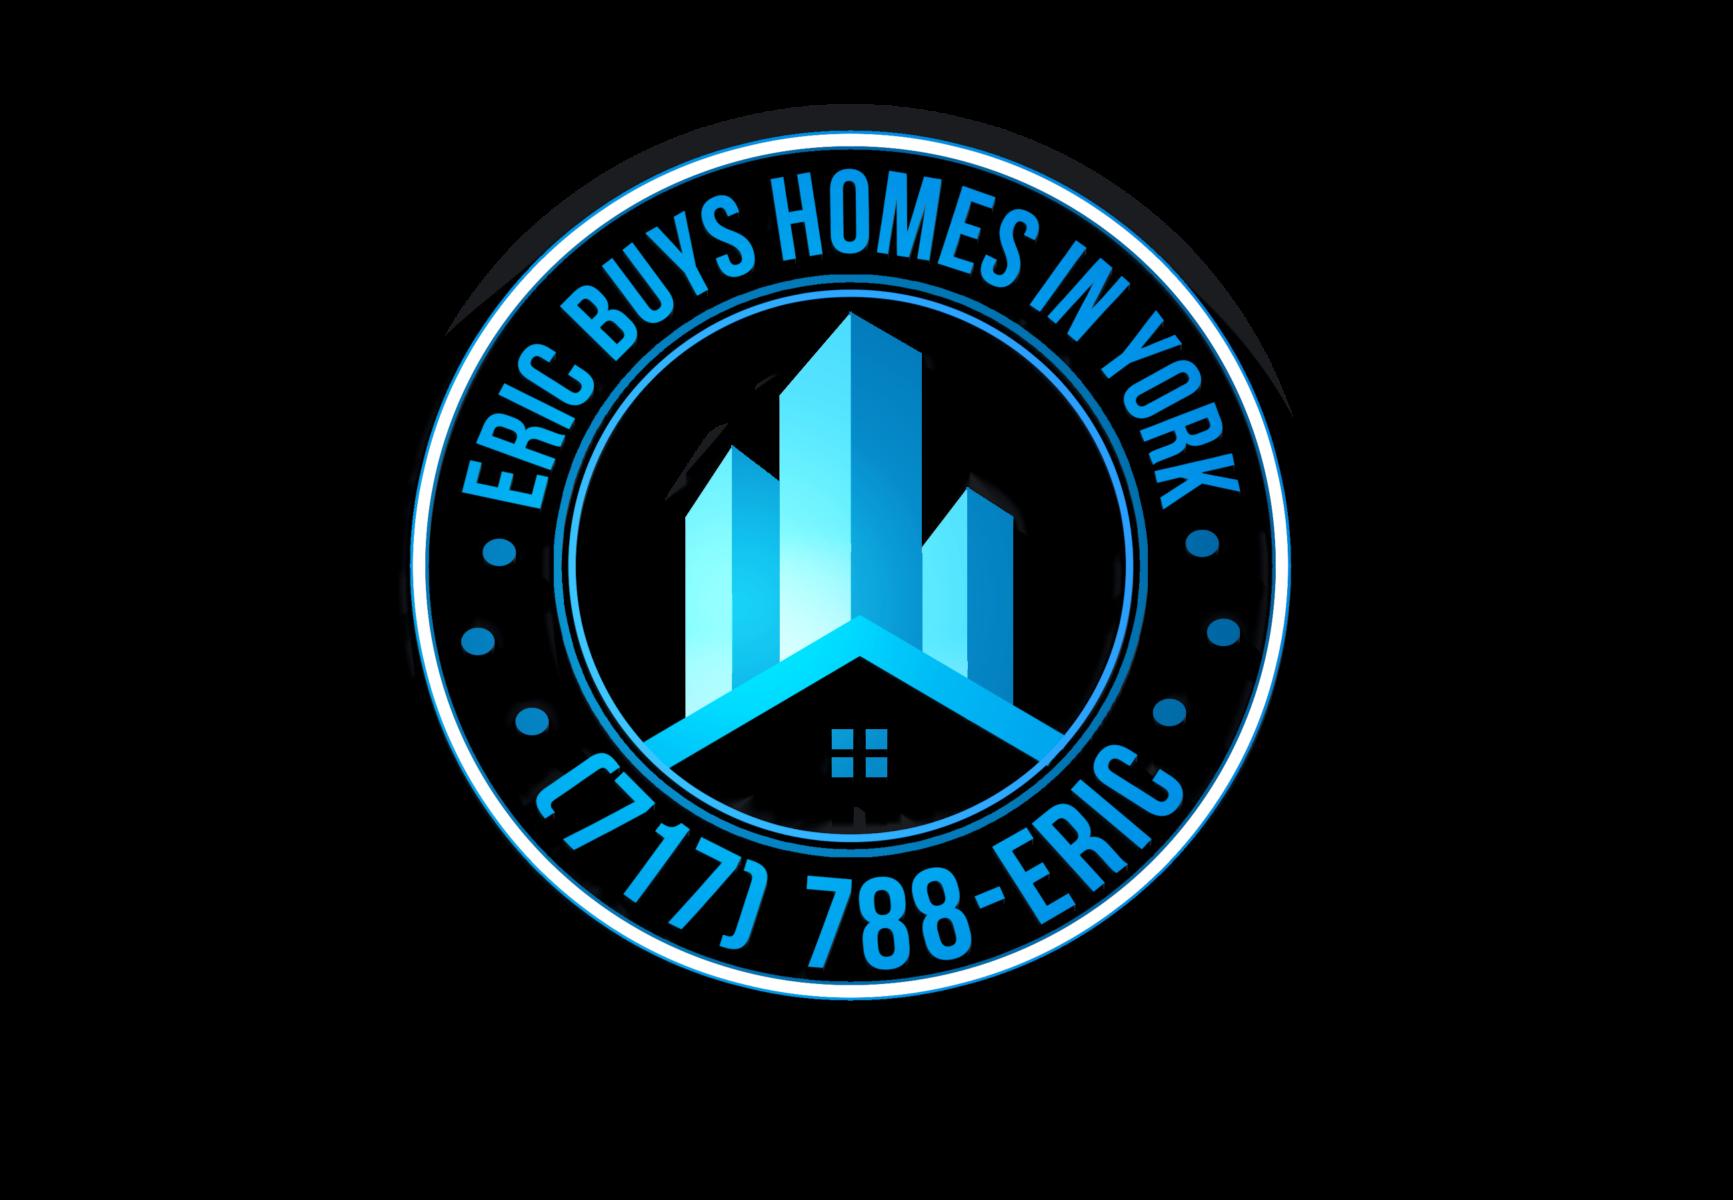 Eric Buys Homes In York logo